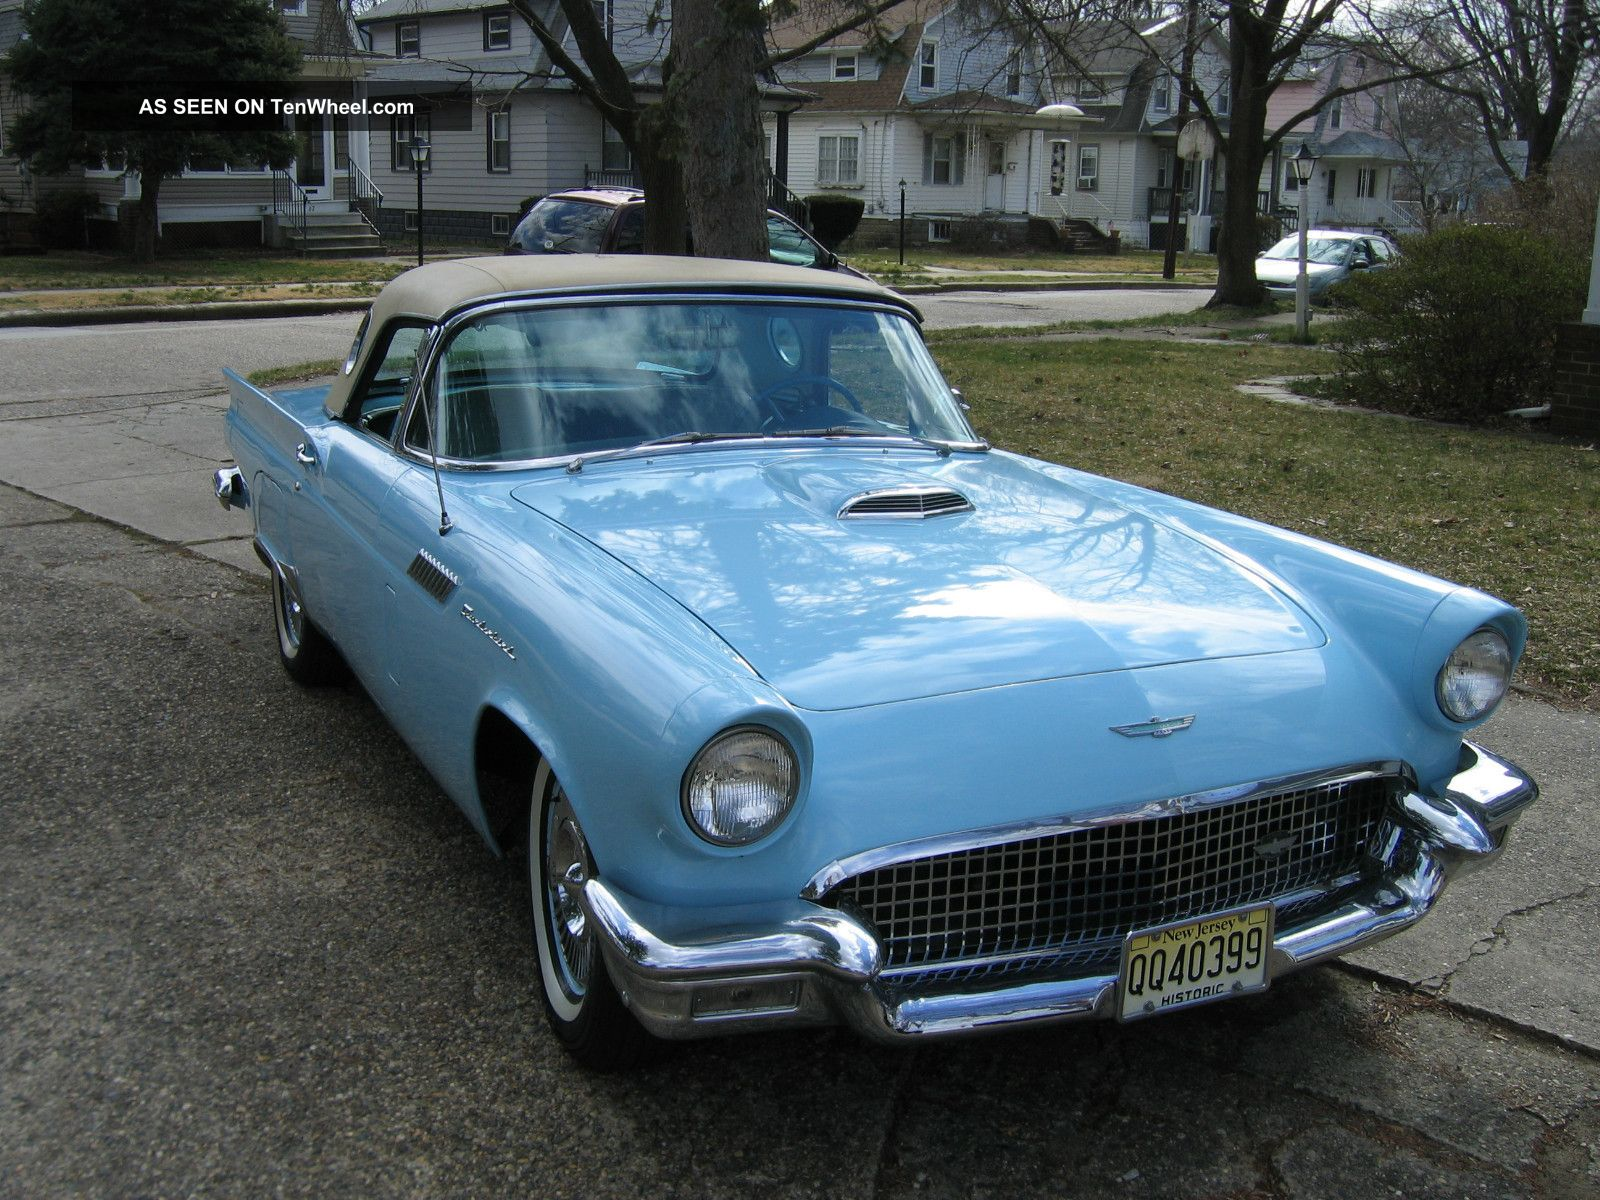 1957 Thunderbird Convertible In Starmist Blue With A / C Thunderbird photo